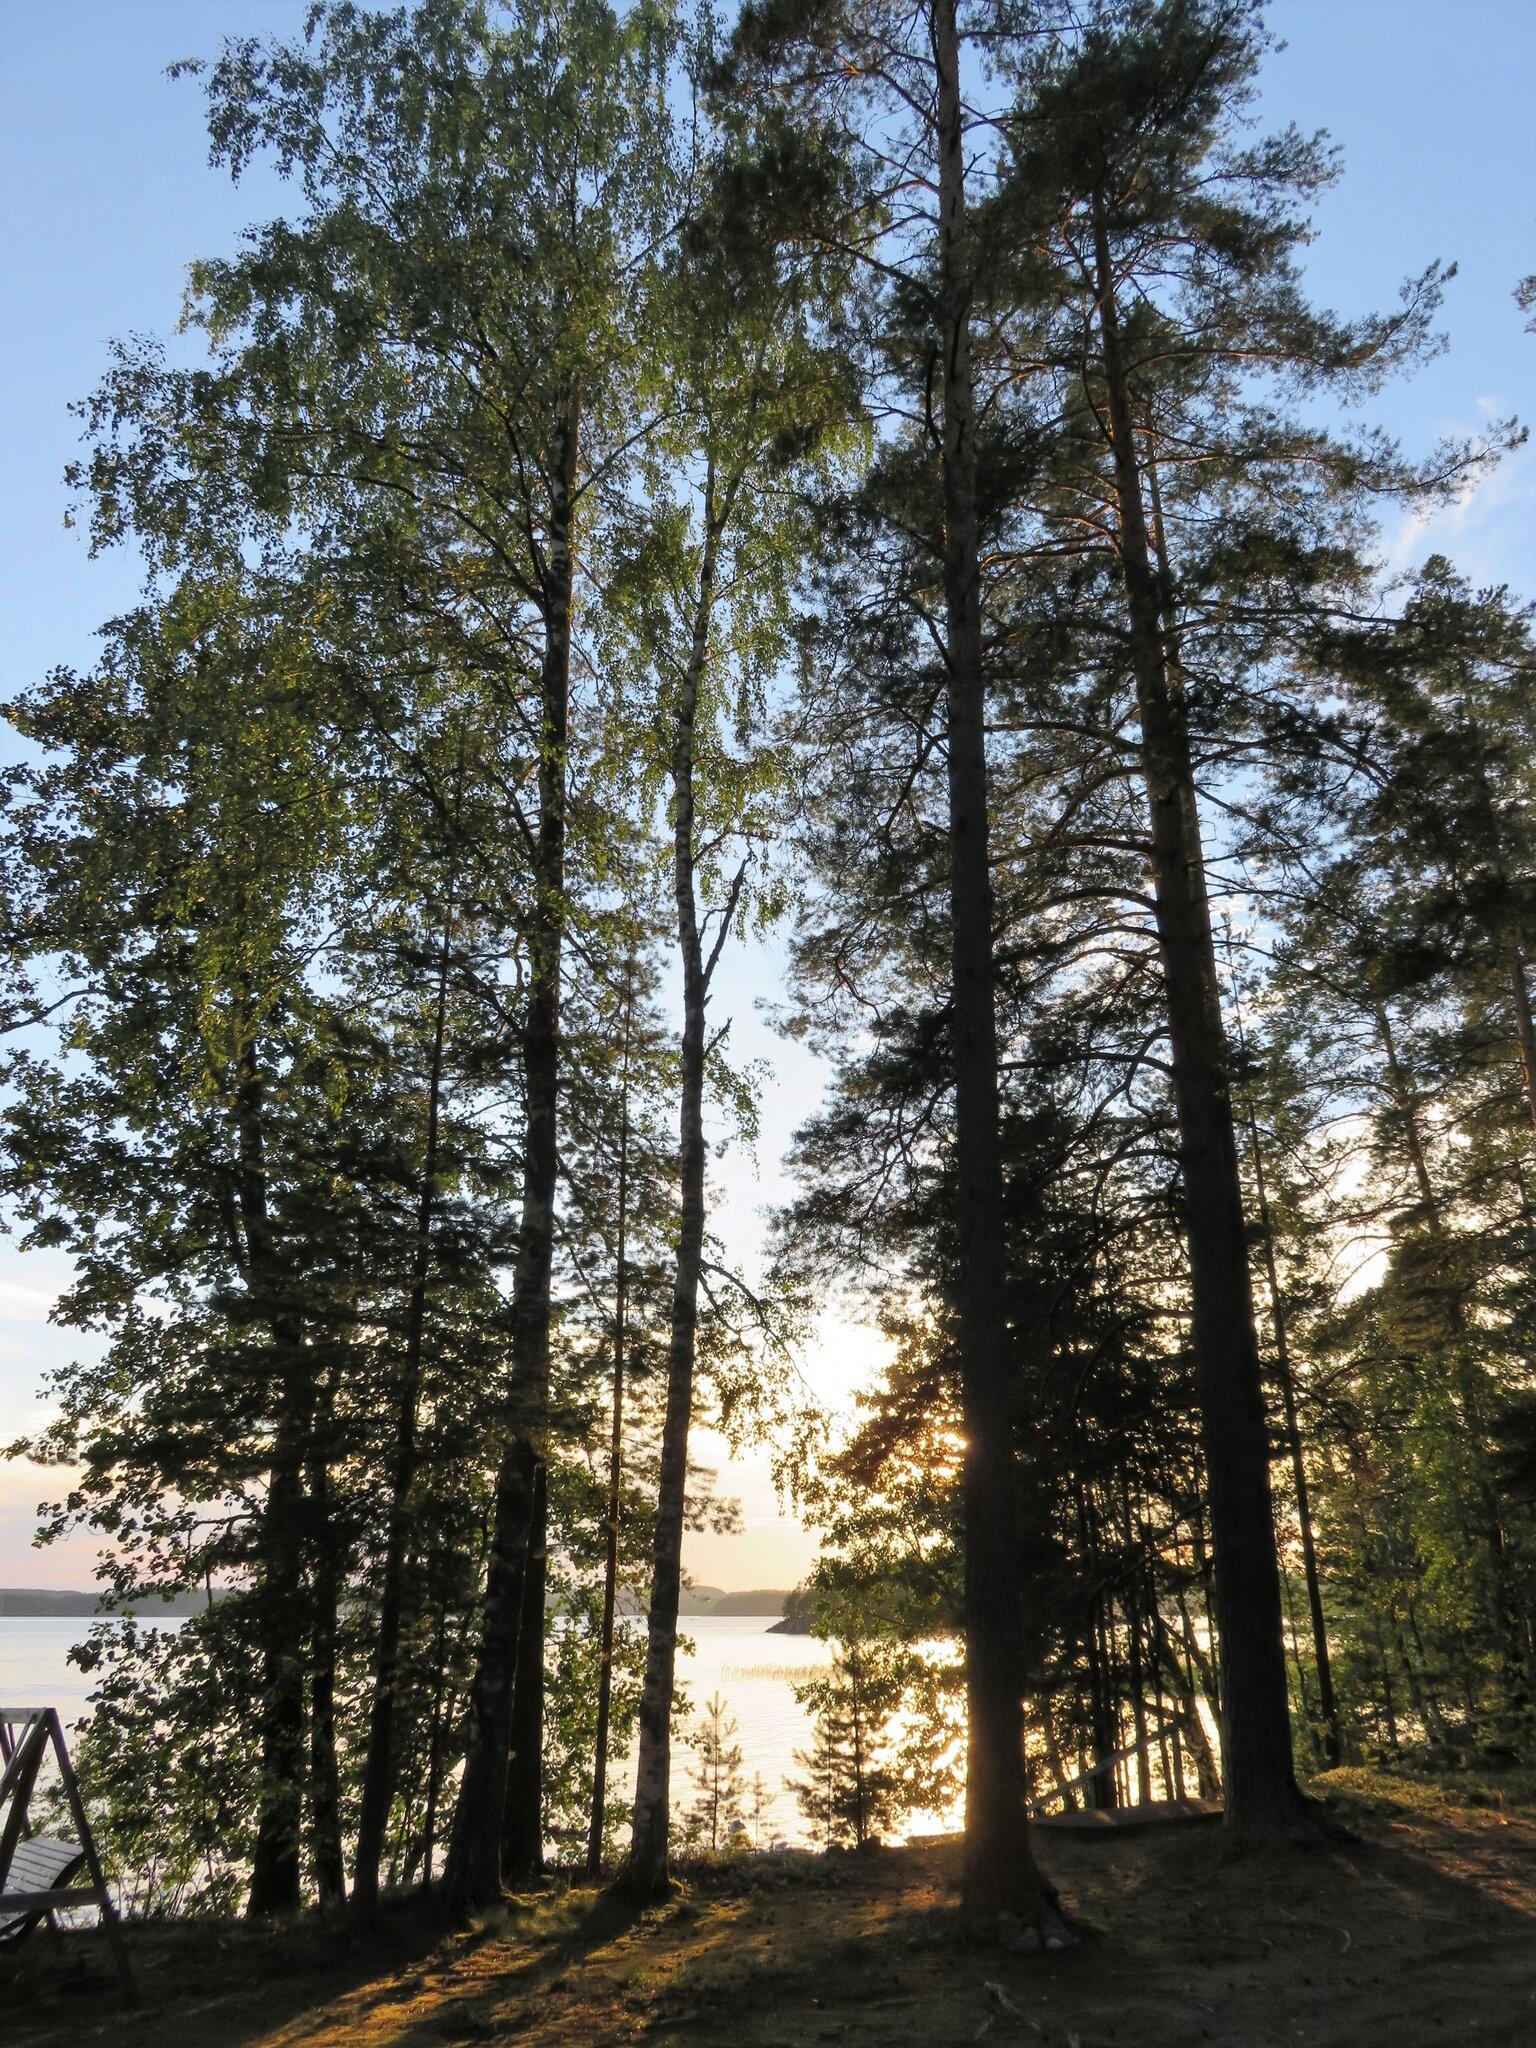 FINLANDE, Puumala. Les gardiens du lac